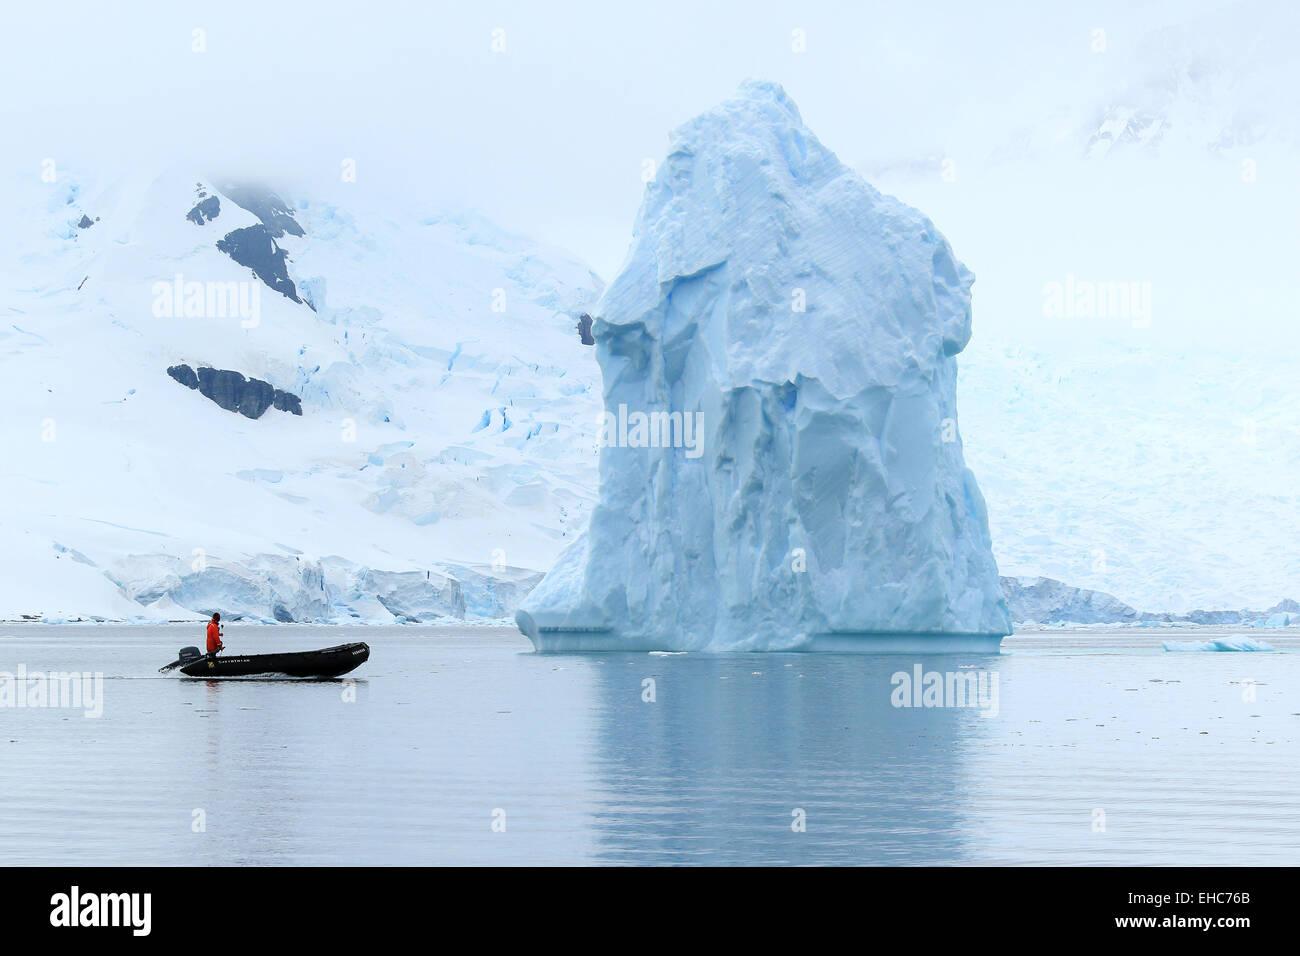 Antarctica iceberg, ice berg, floats in Antarctica landscape of ice with Zodiac driver. - Stock Image